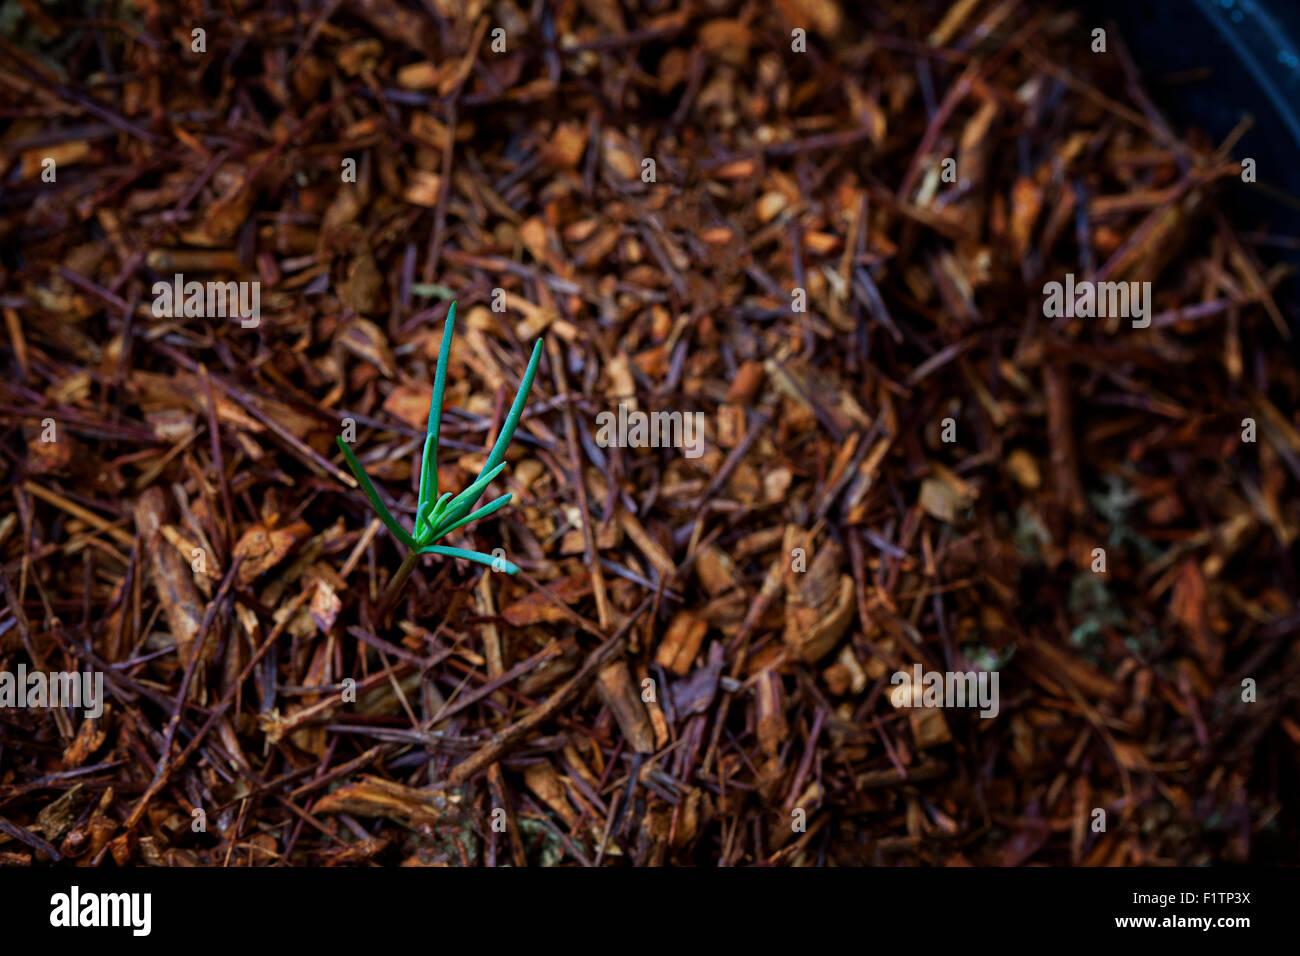 Newly germinated Giant Sequoia tree seedling - Stock Image